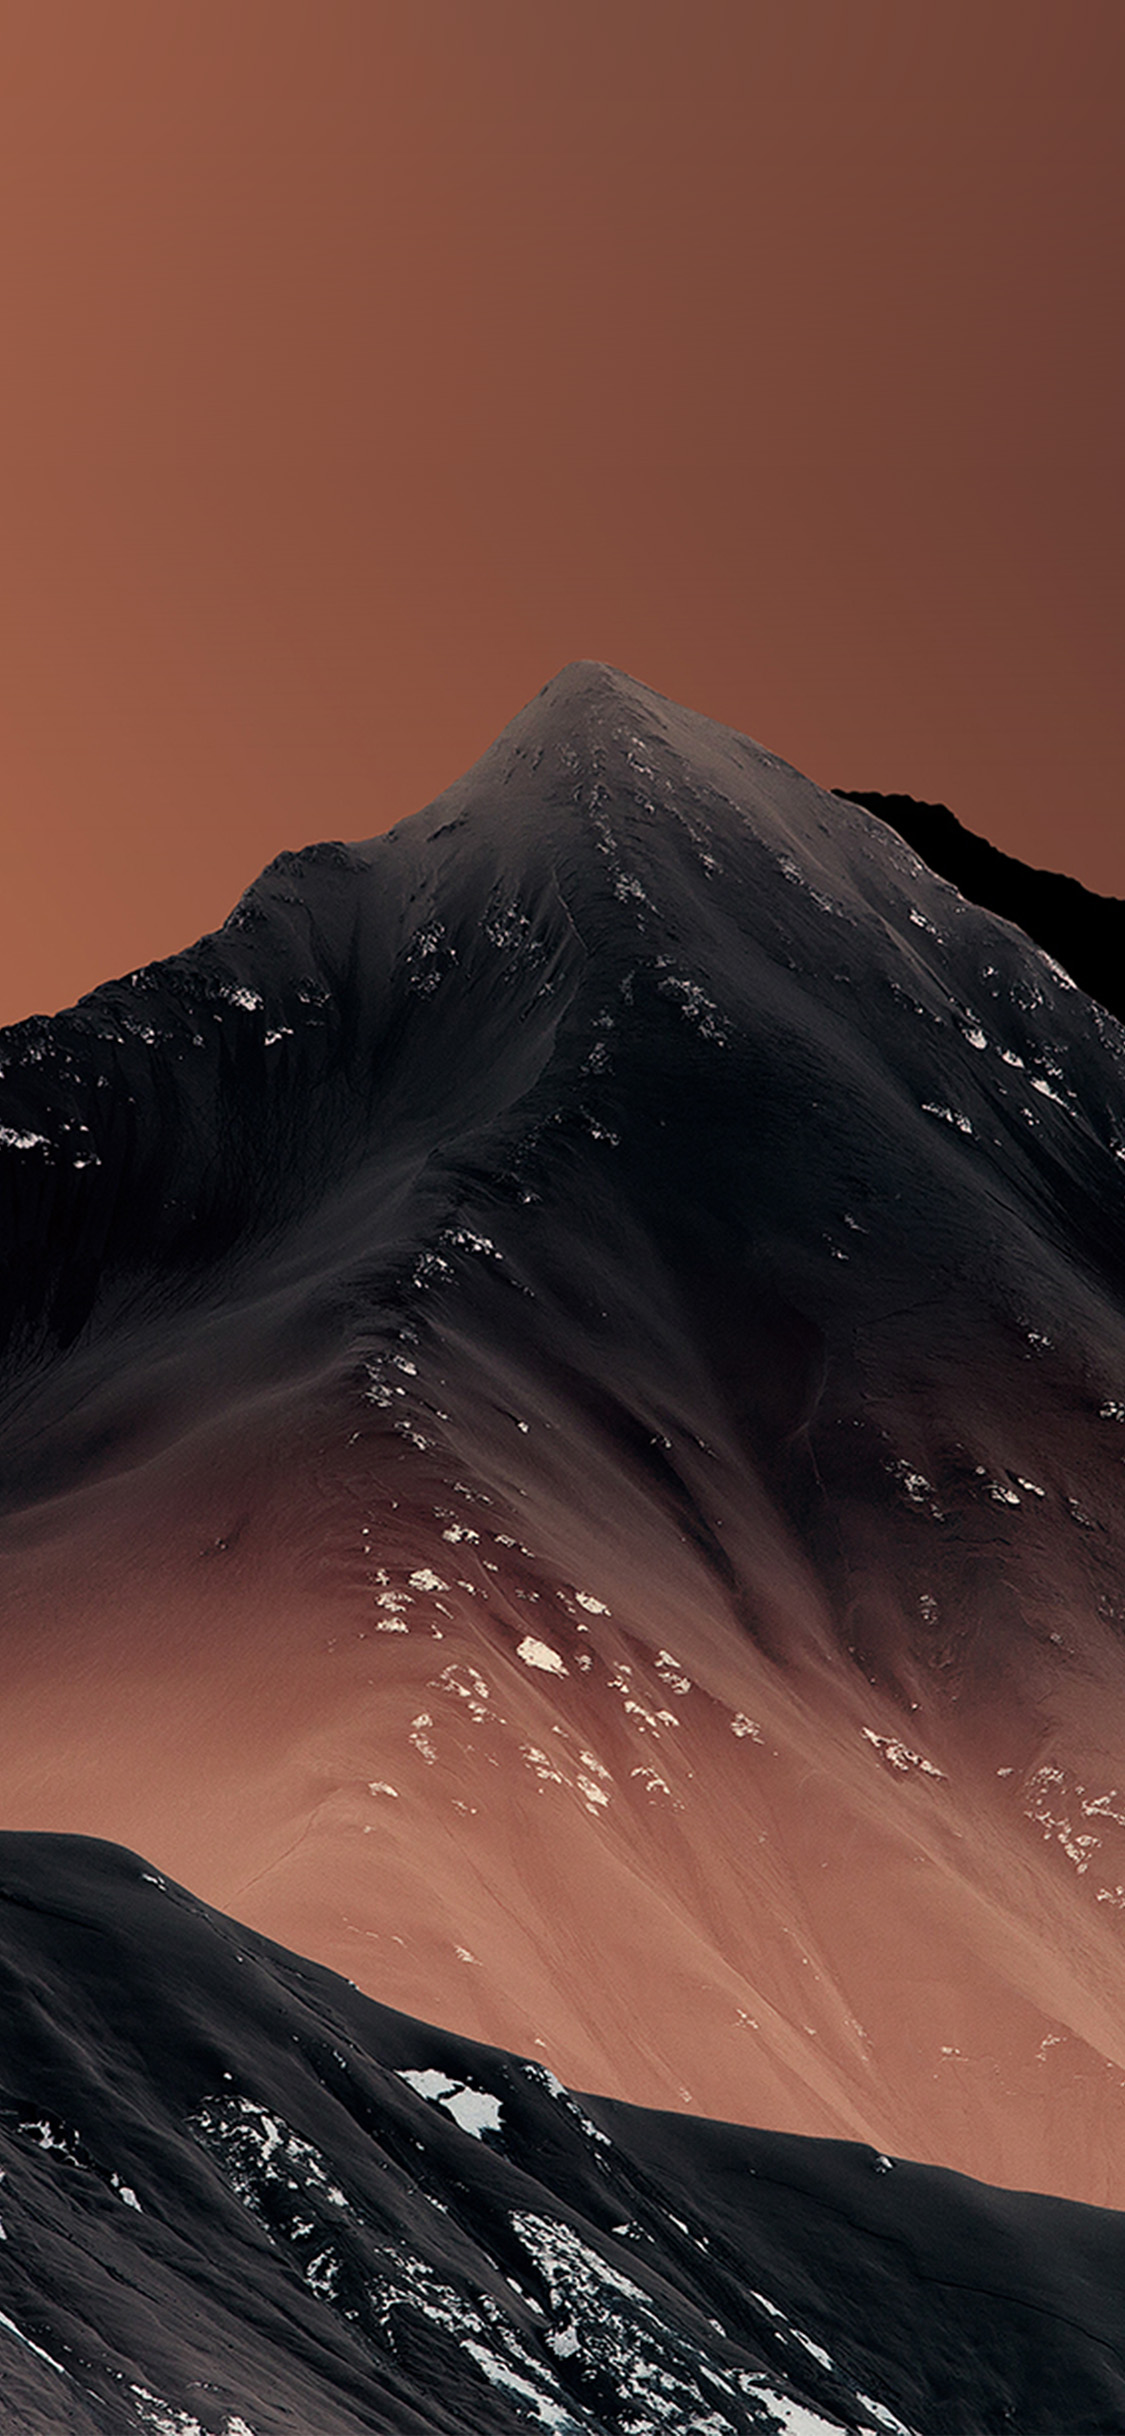 iPhonexpapers.com-Apple-iPhone-wallpaper-vz97-mountain-orange-art-pattern-background